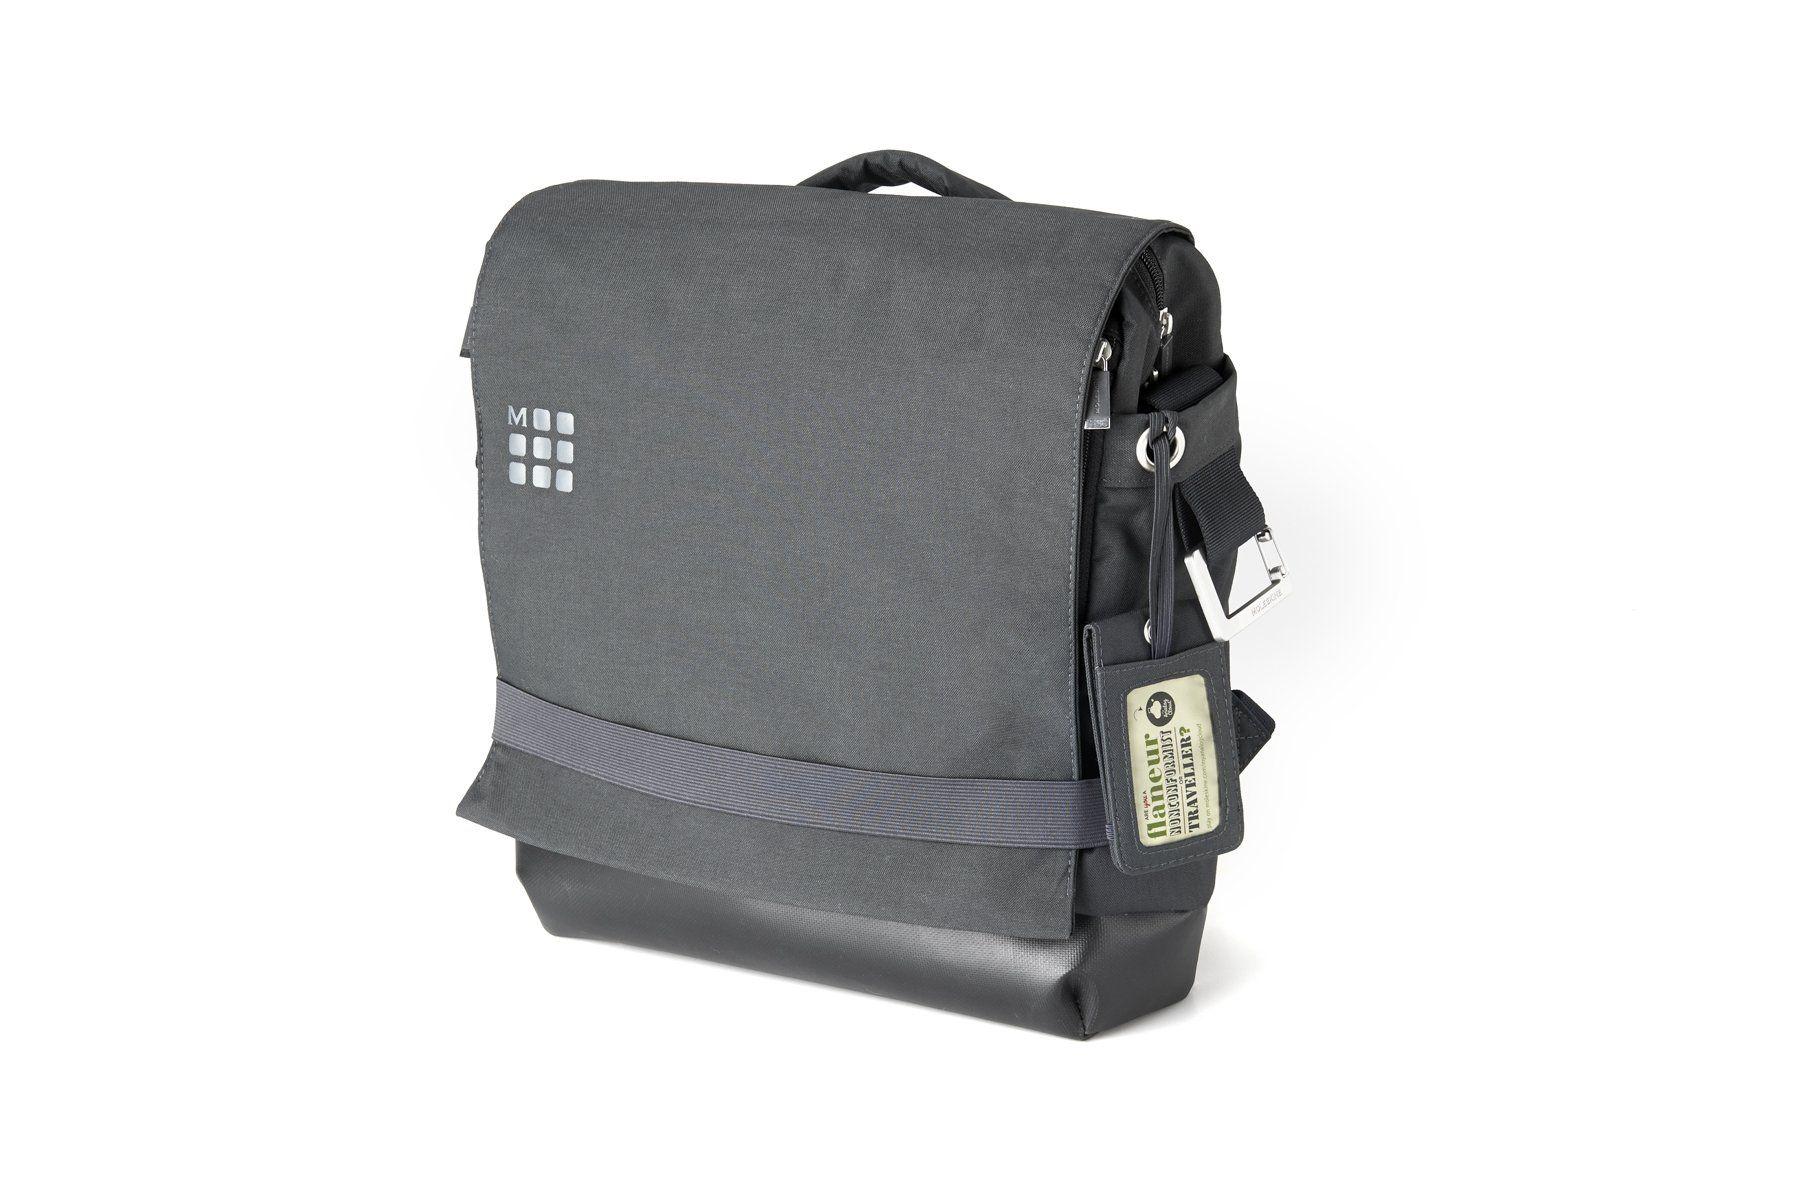 Grey Backpack Pinterest Payne's Moleskine Gadgets Mycloud zqgPxZU